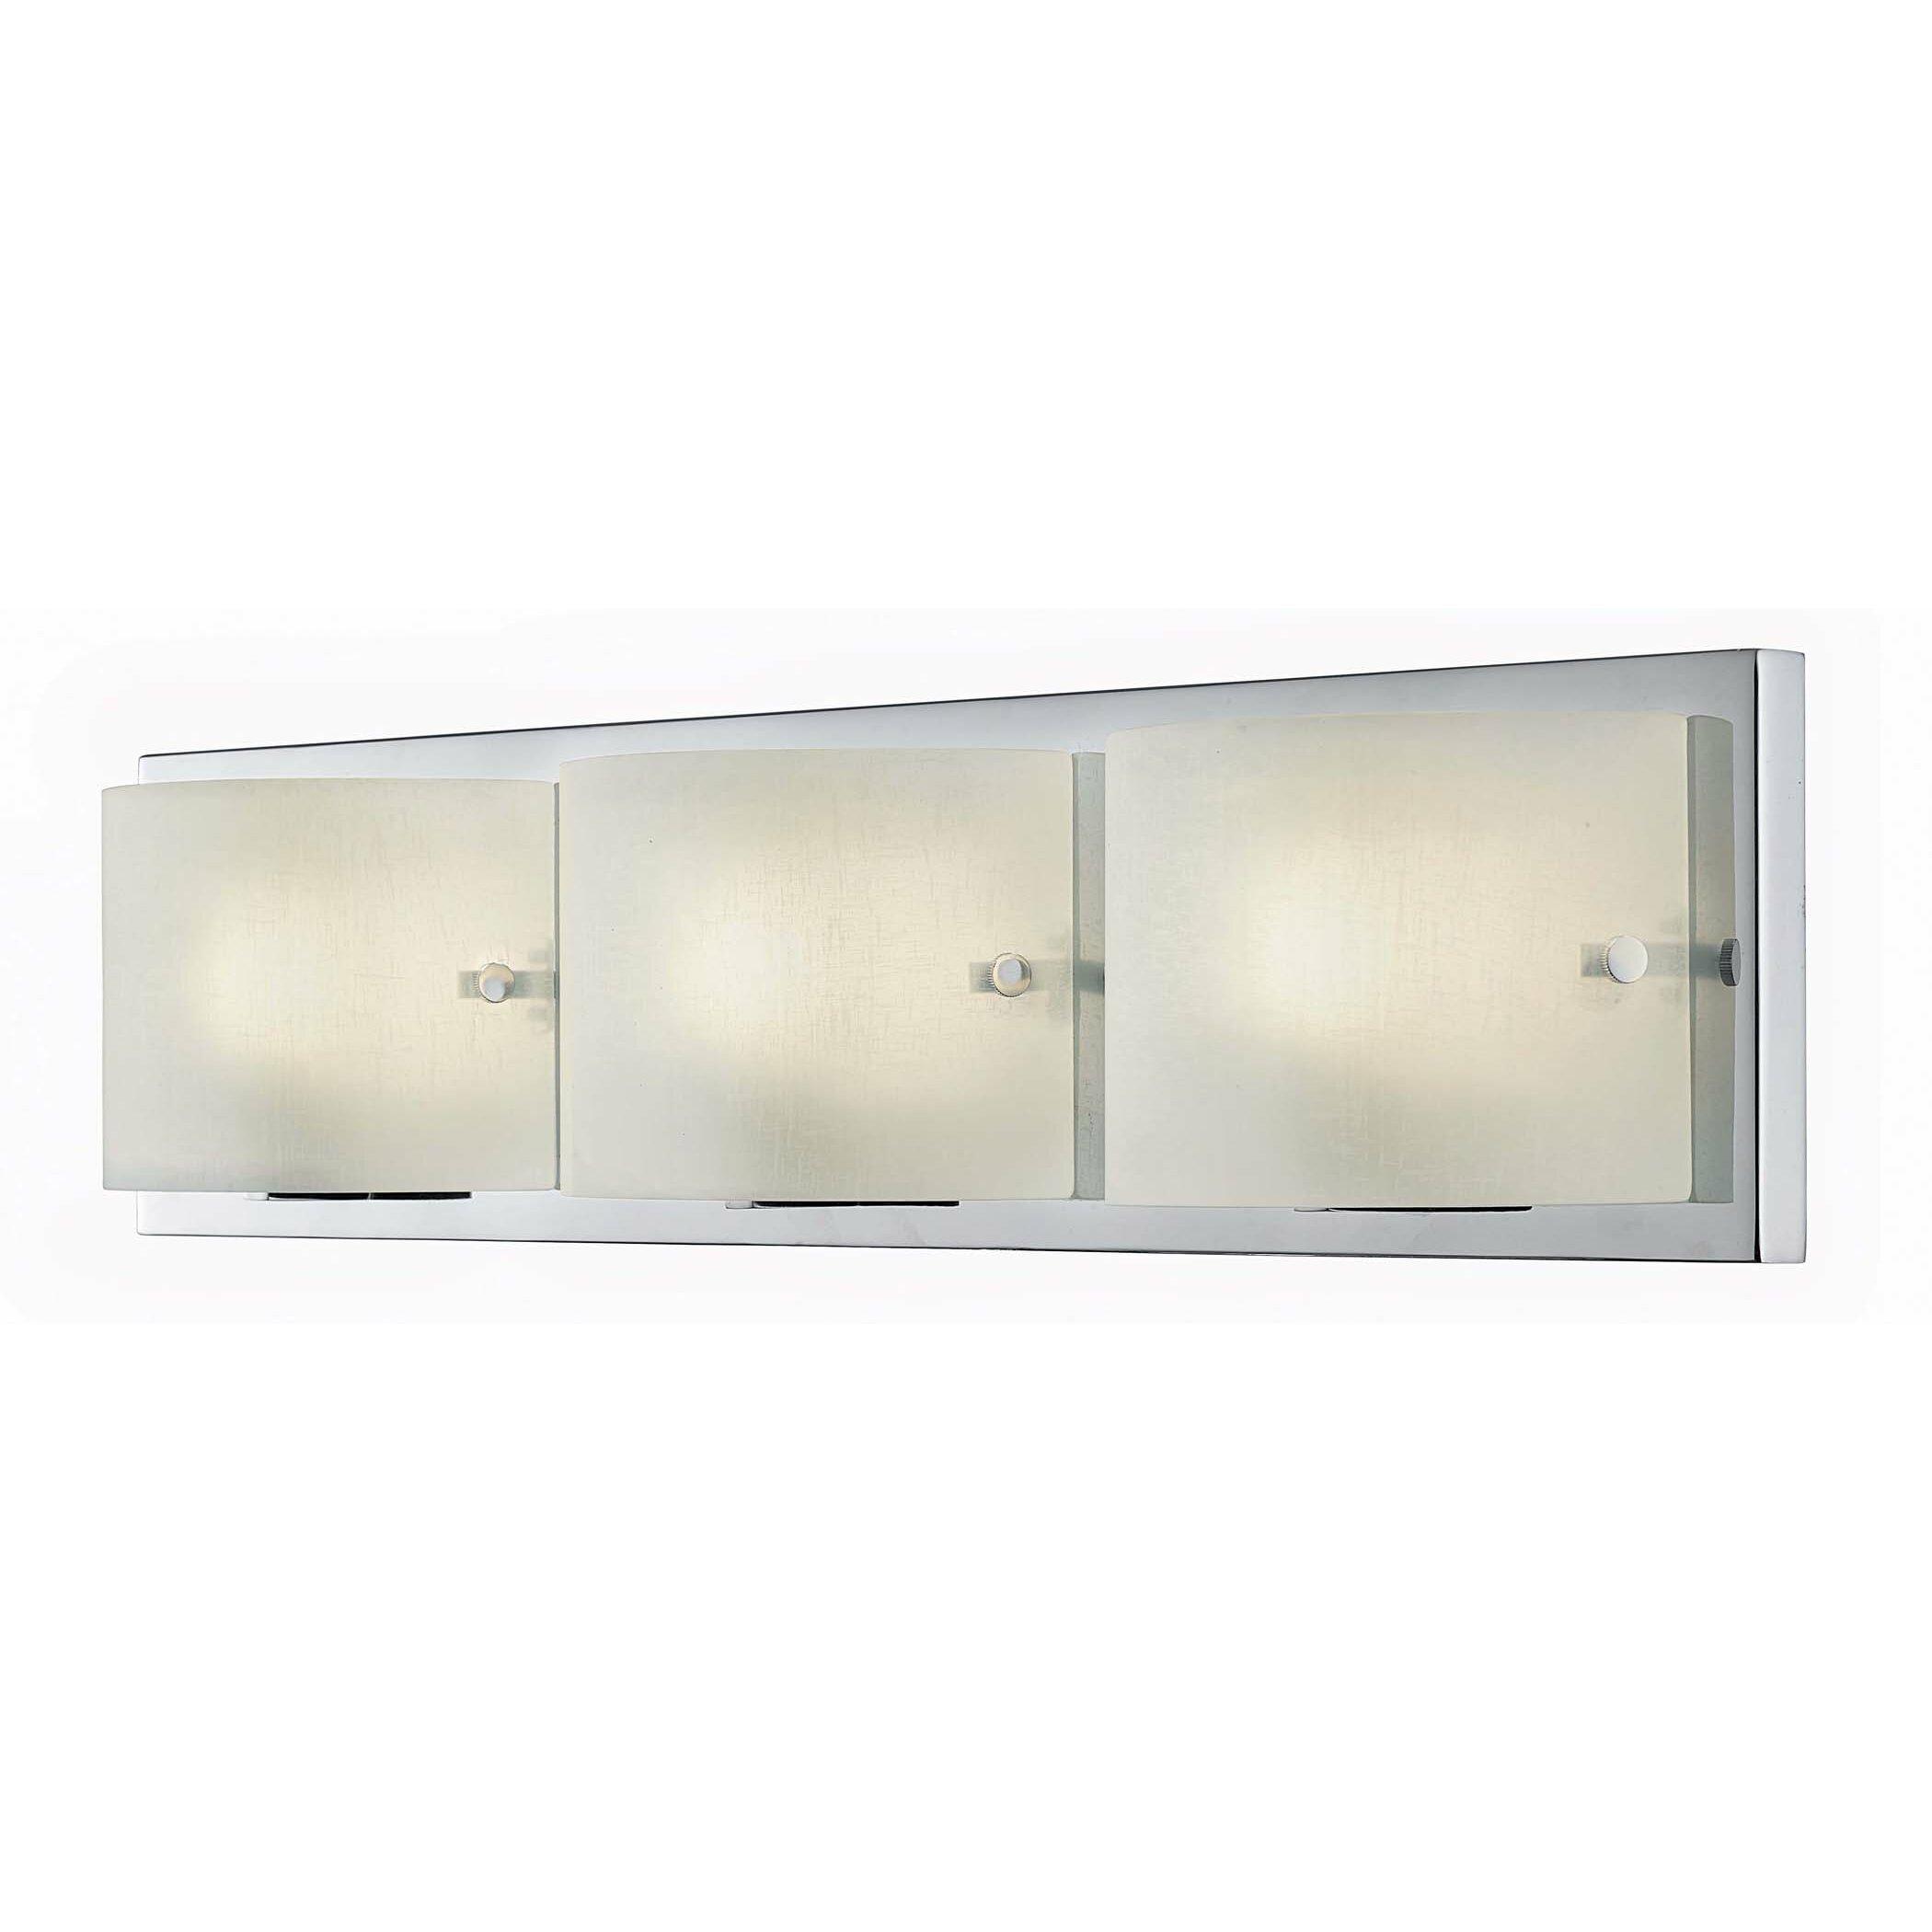 Bathroom Vanity Lights Reviews bathroom vanity light covers charlton home allston 3 light bath